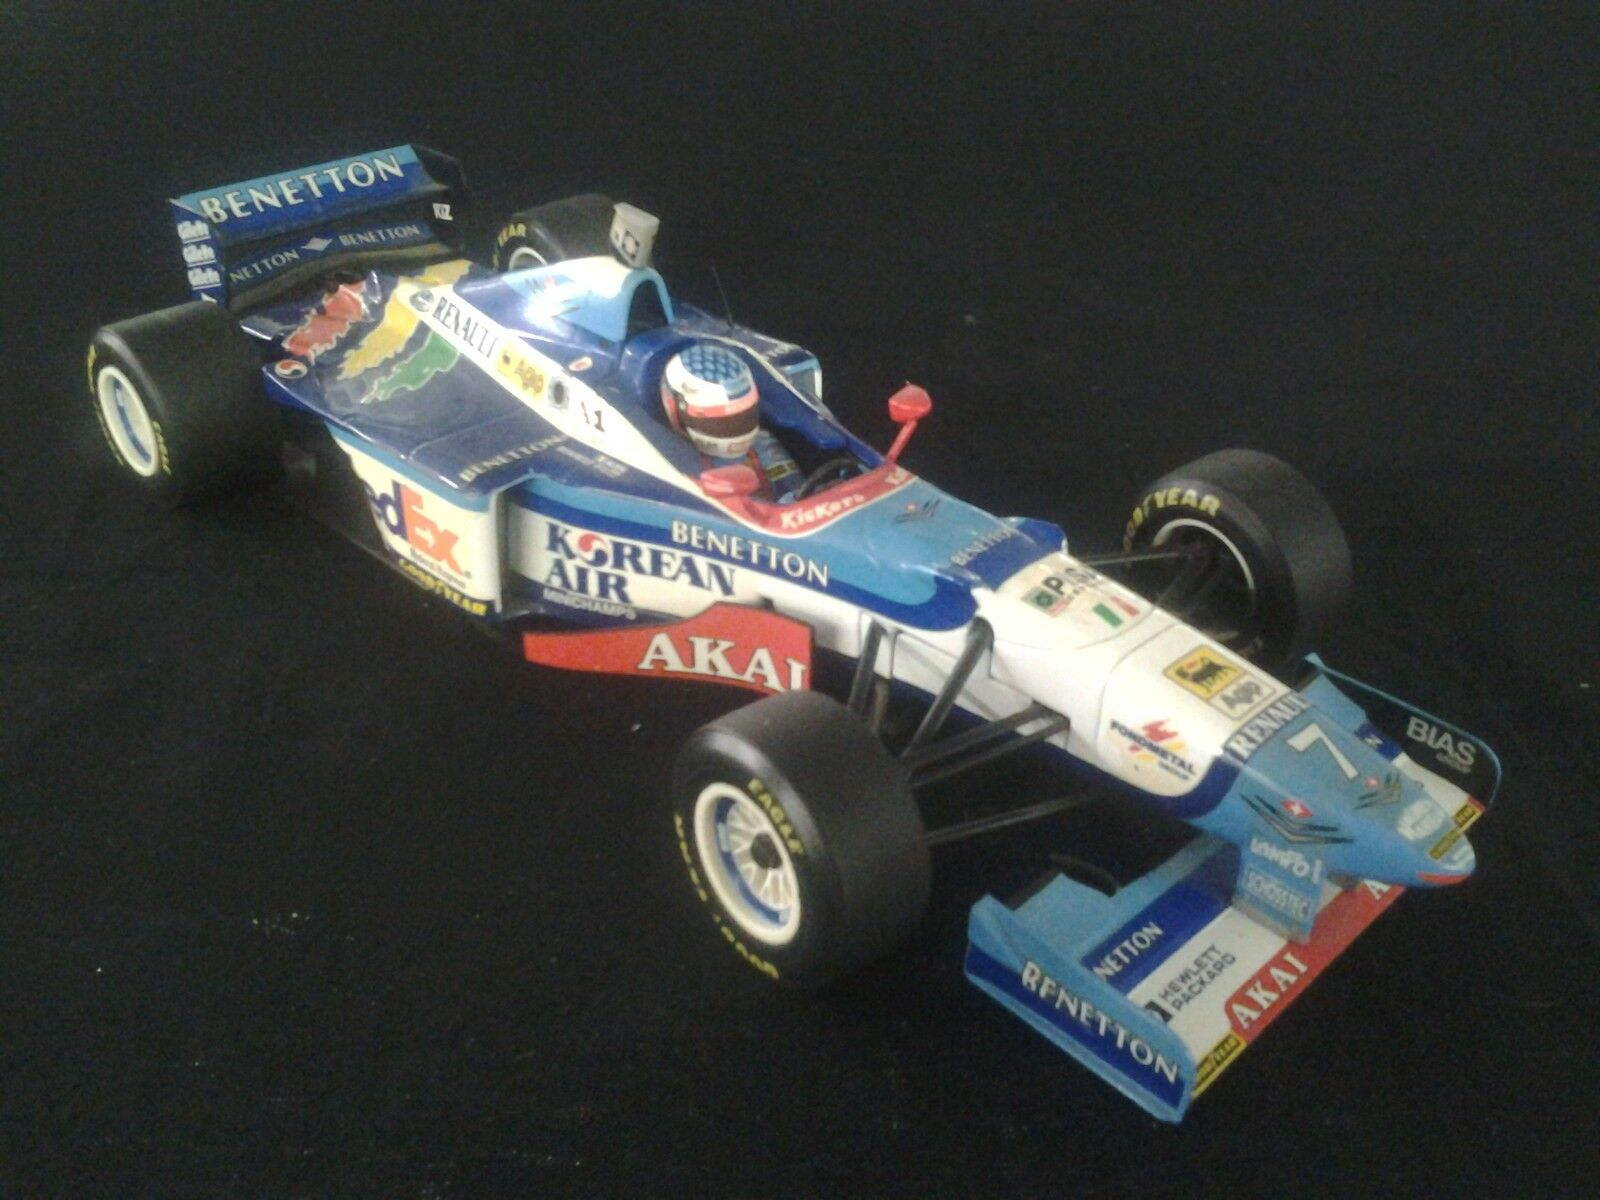 Minichamps Benetton Renault B197 1997 1 18 Jean Alesi (FRA) Formula 1 (MCC)